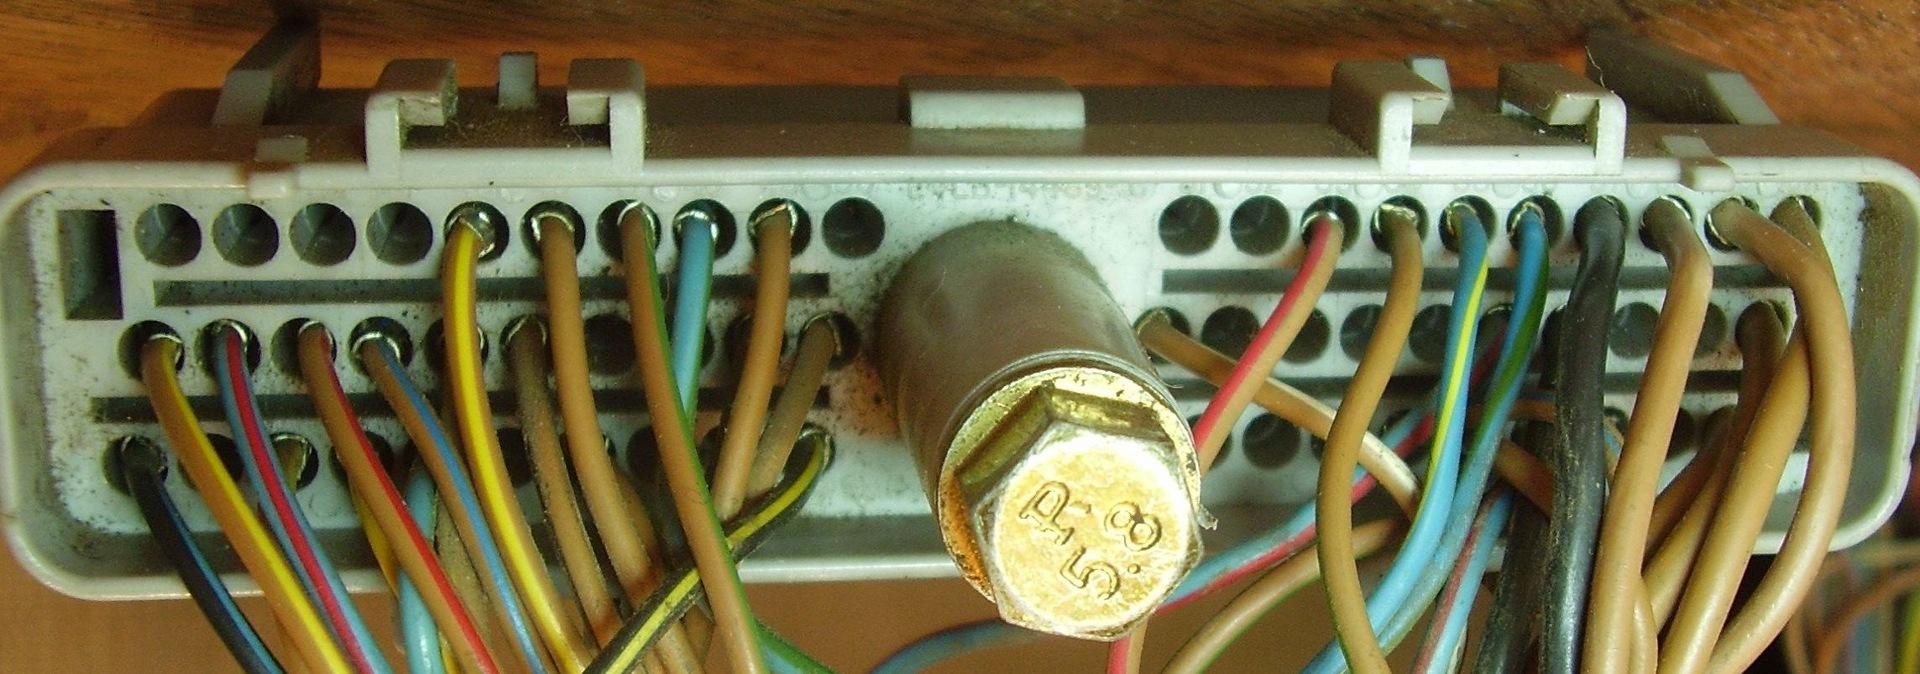 схема электропроводки автомобиля форд скорпио